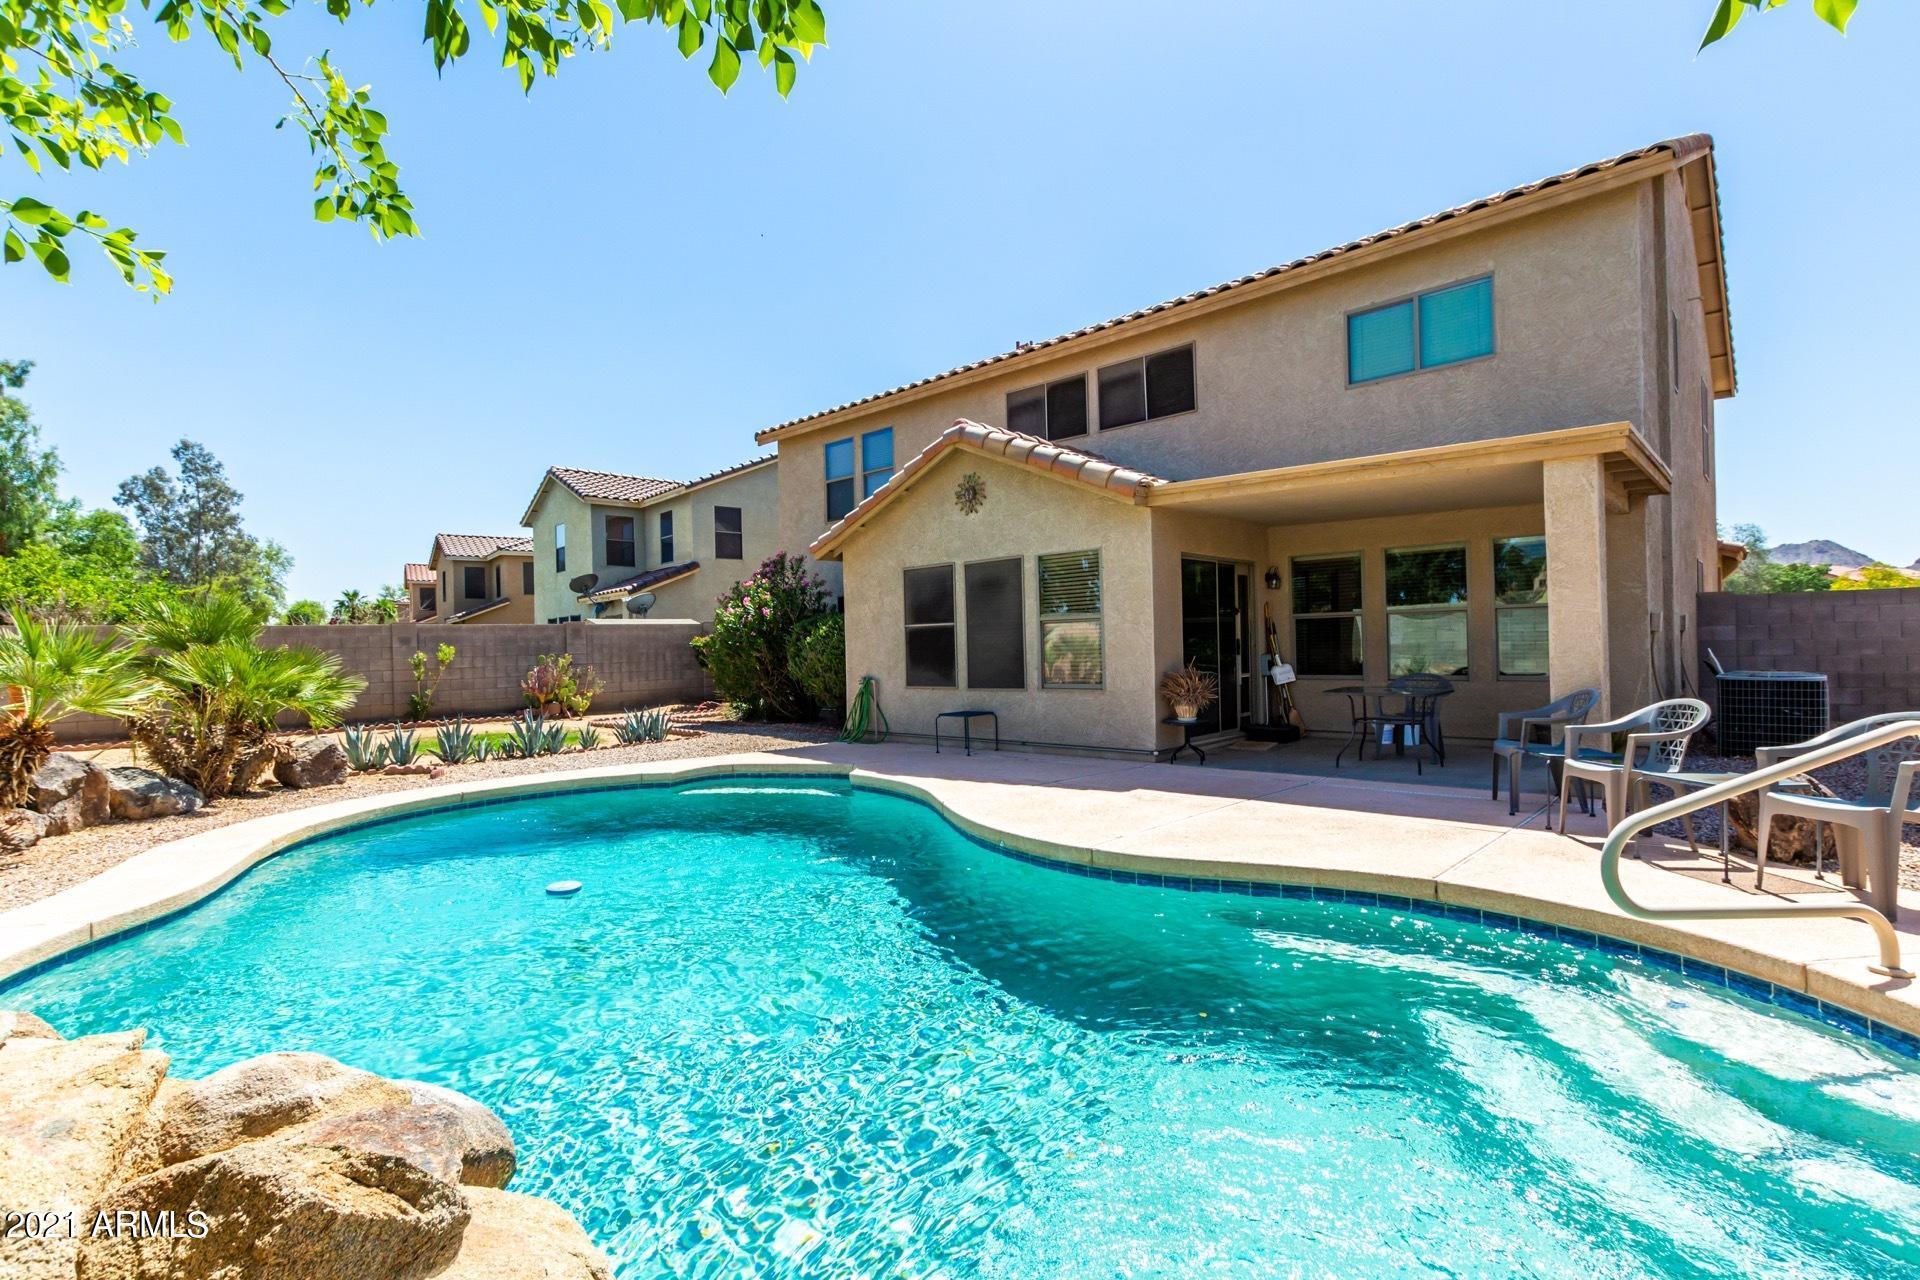 33123 SONORAN Trail, Queen Creek, Arizona 85142, 5 Bedrooms Bedrooms, ,3.5 BathroomsBathrooms,Residential,For Sale,SONORAN,6235165